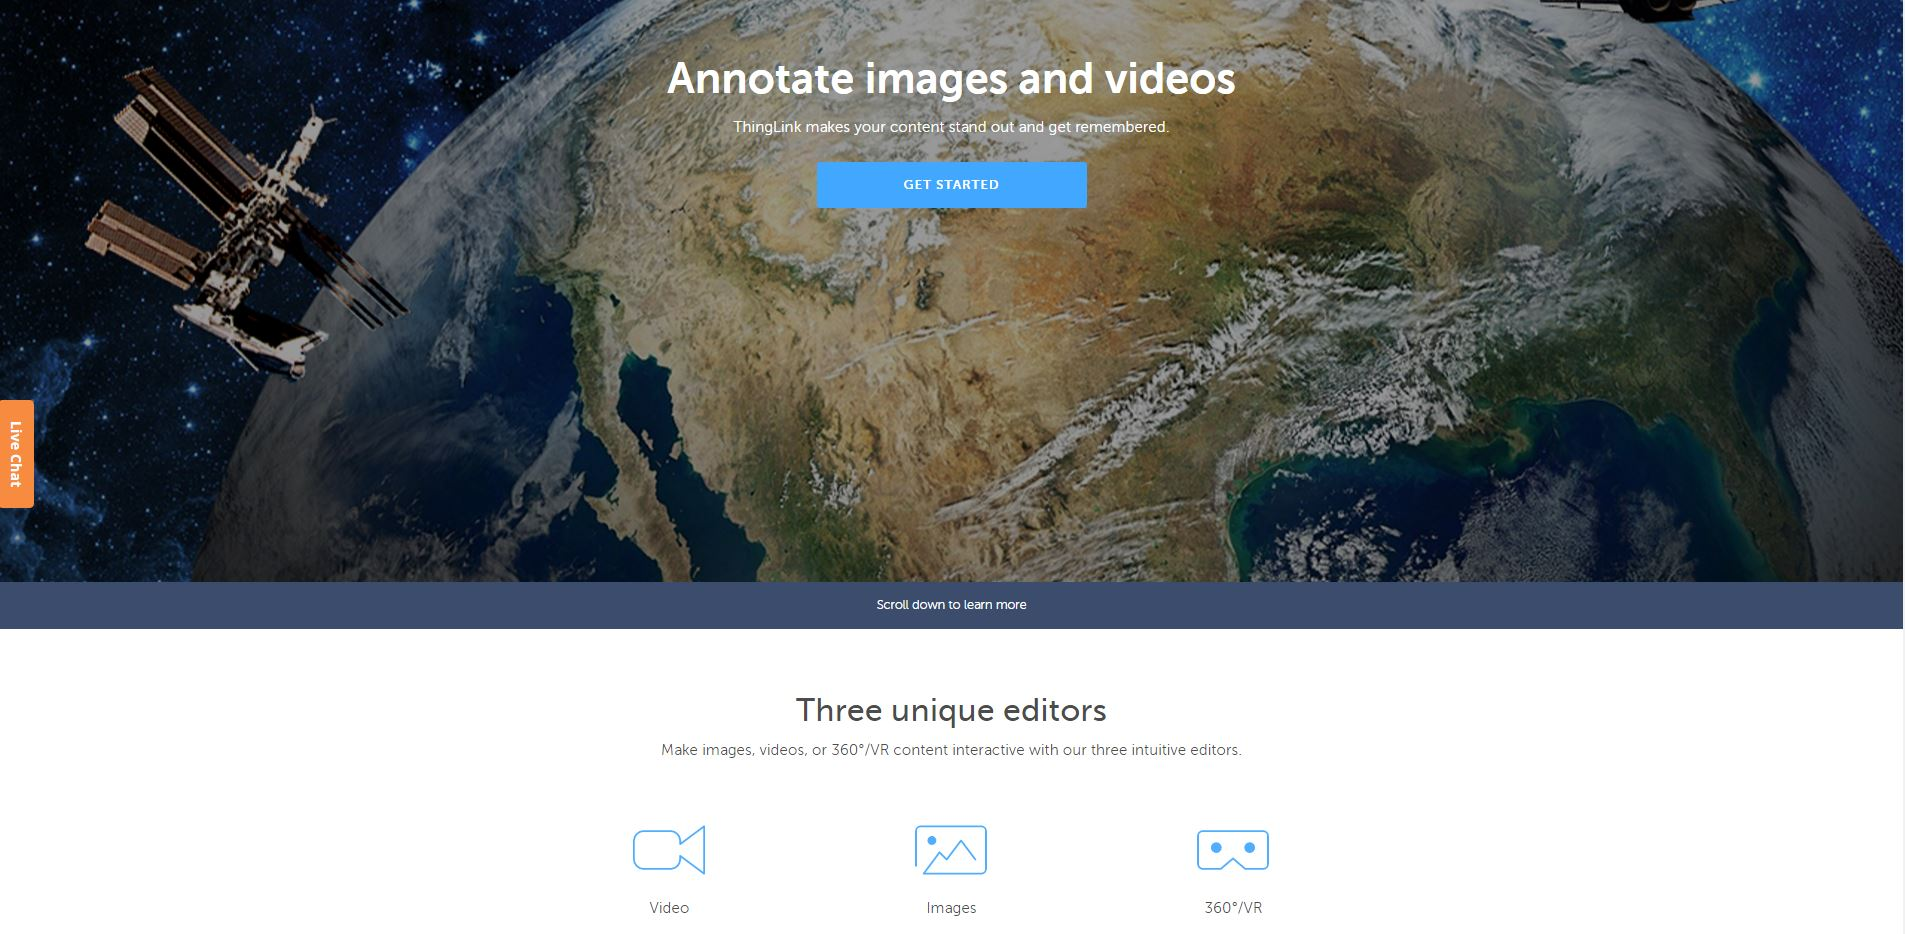 thinglink-crear imagenes online